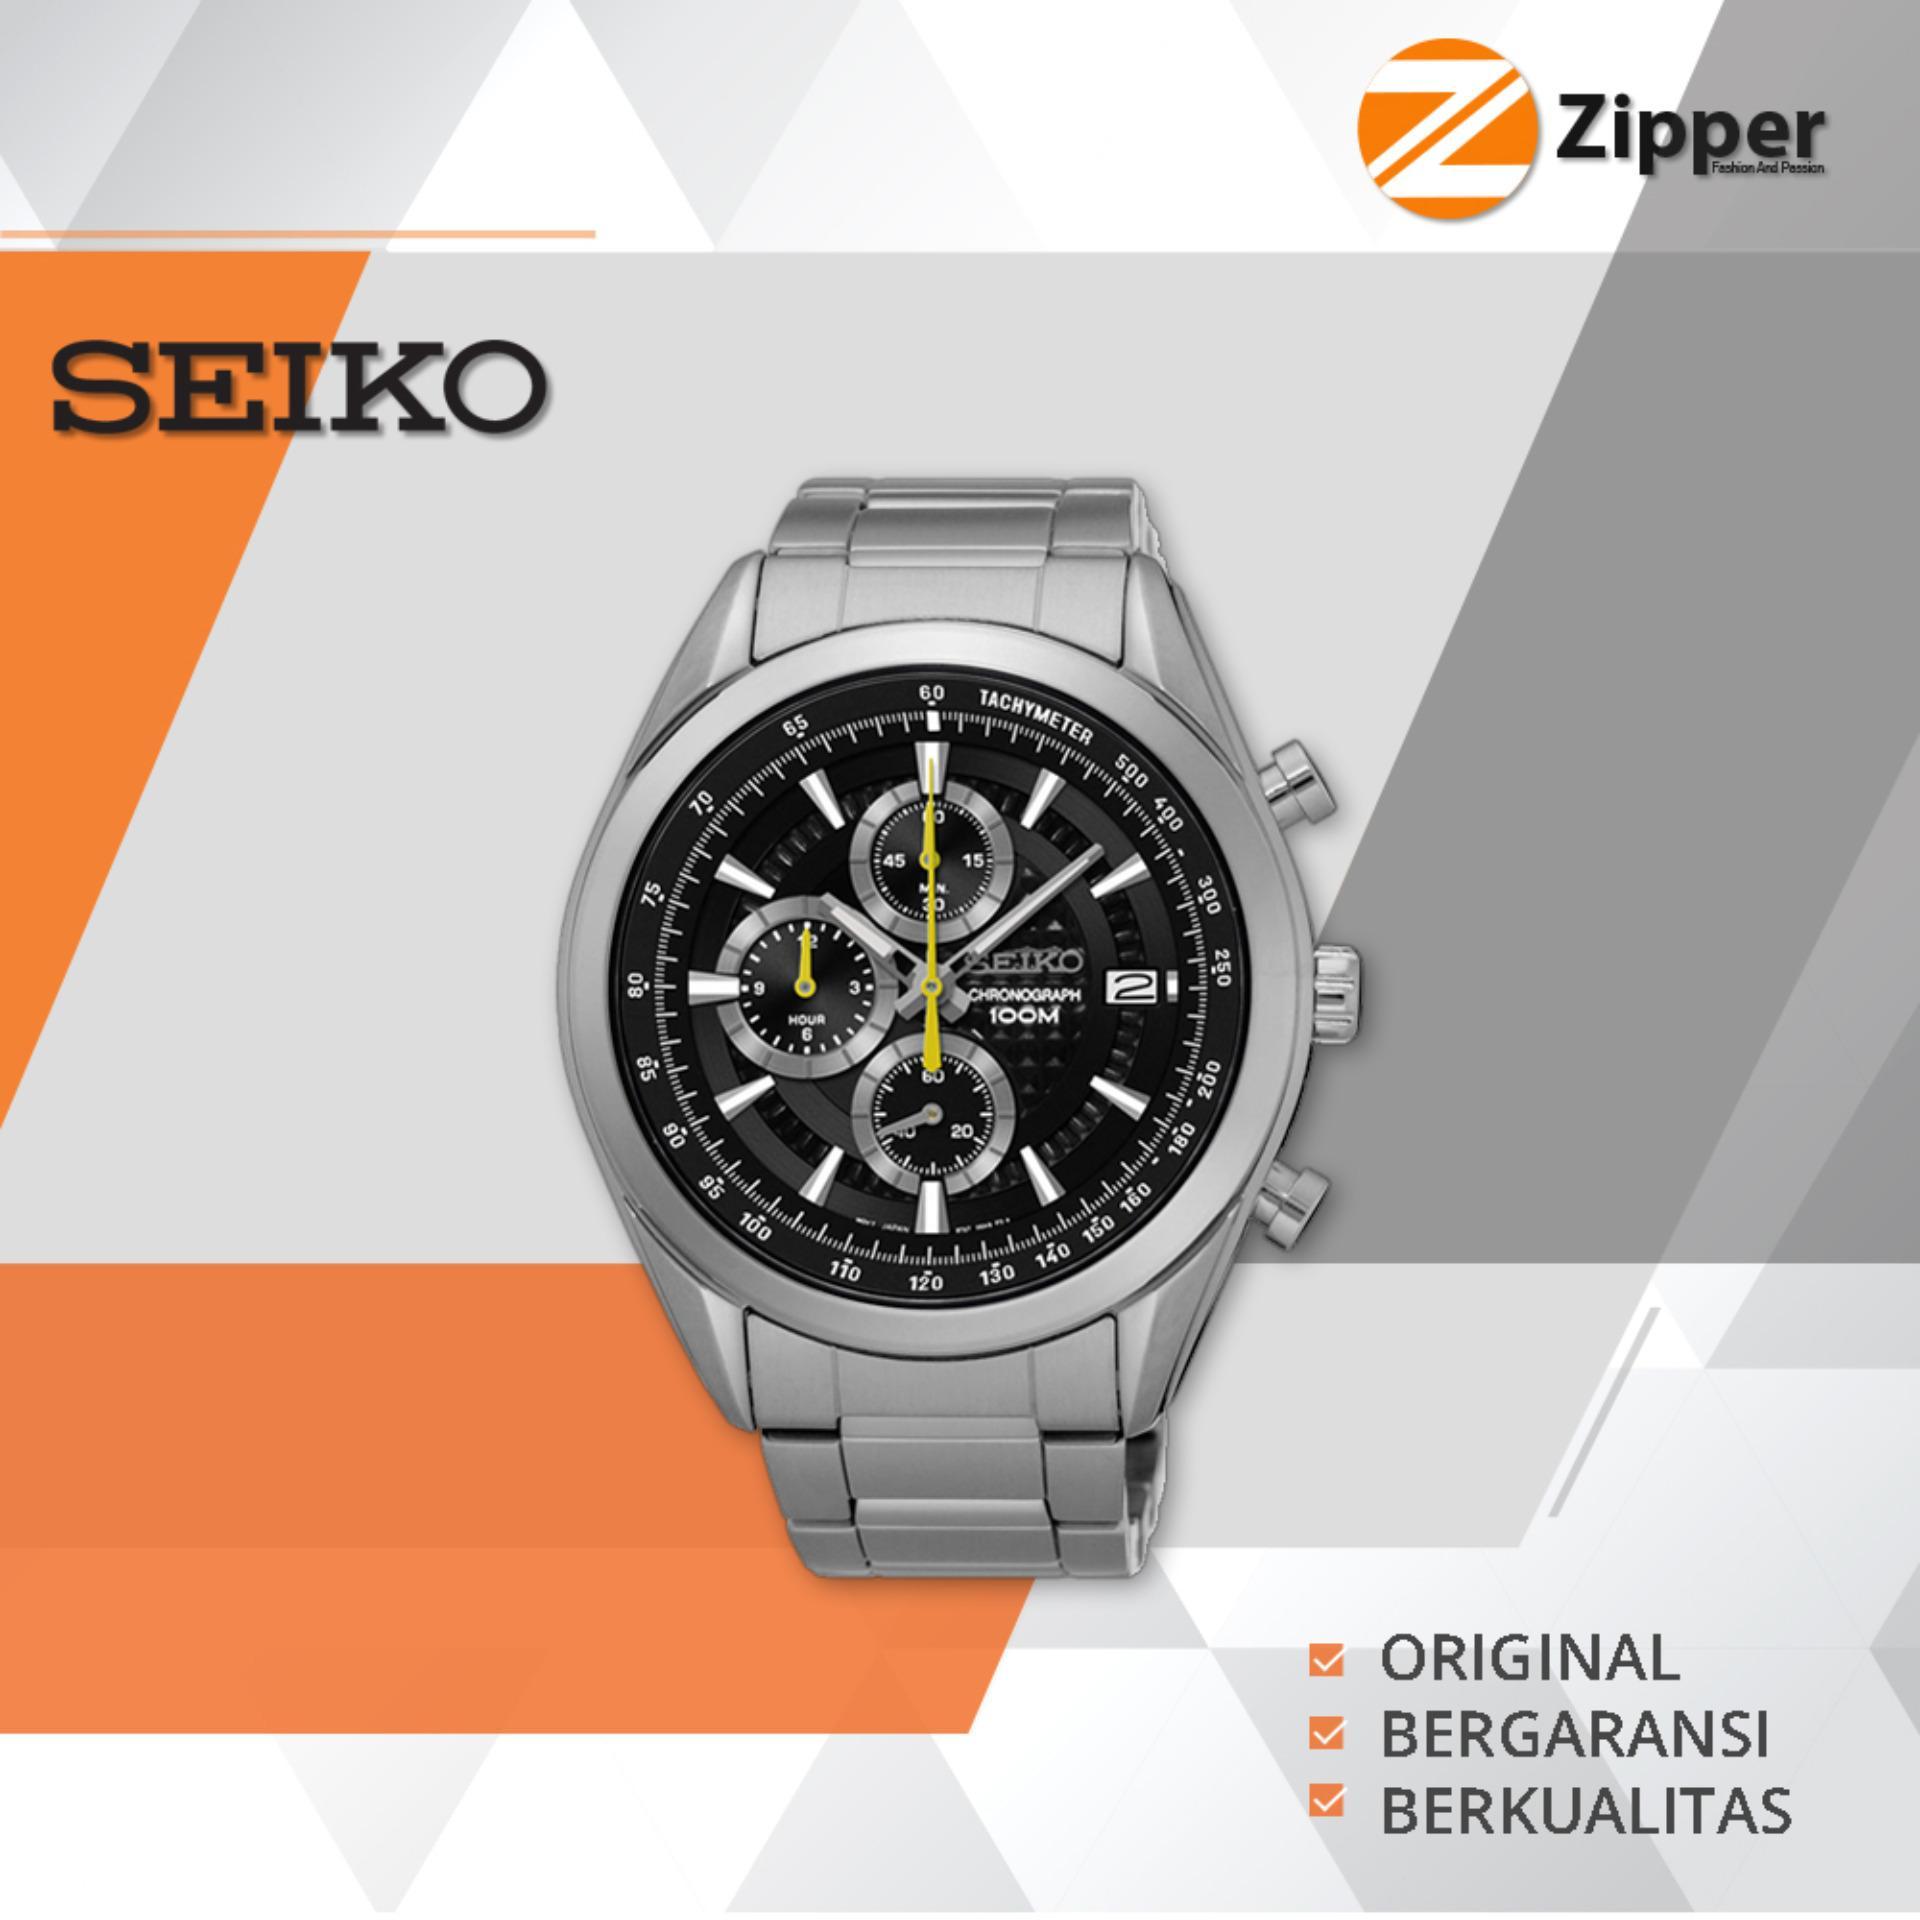 Jual Seiko Chronograph Jam Tangan Pria Tali Stainless Steel Ssb175P1 Seiko Online